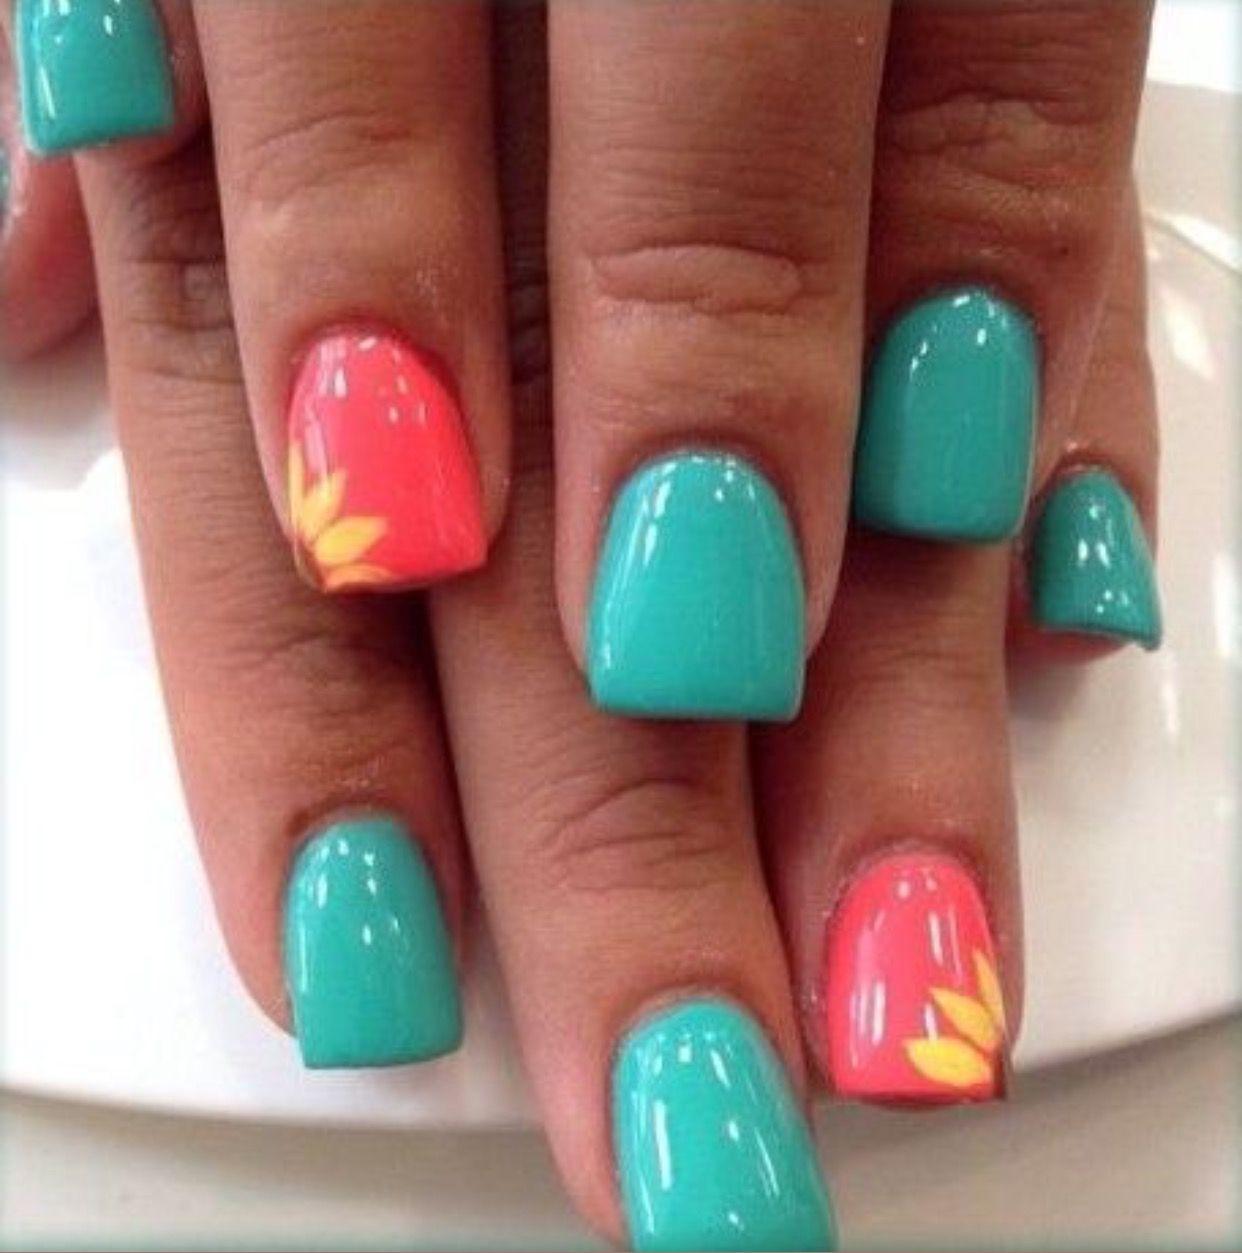 26 Spring Acrylic Nail Designs Ideas: Cute Summer Nail Ideas// Teal & Coral Nails// Sunflower